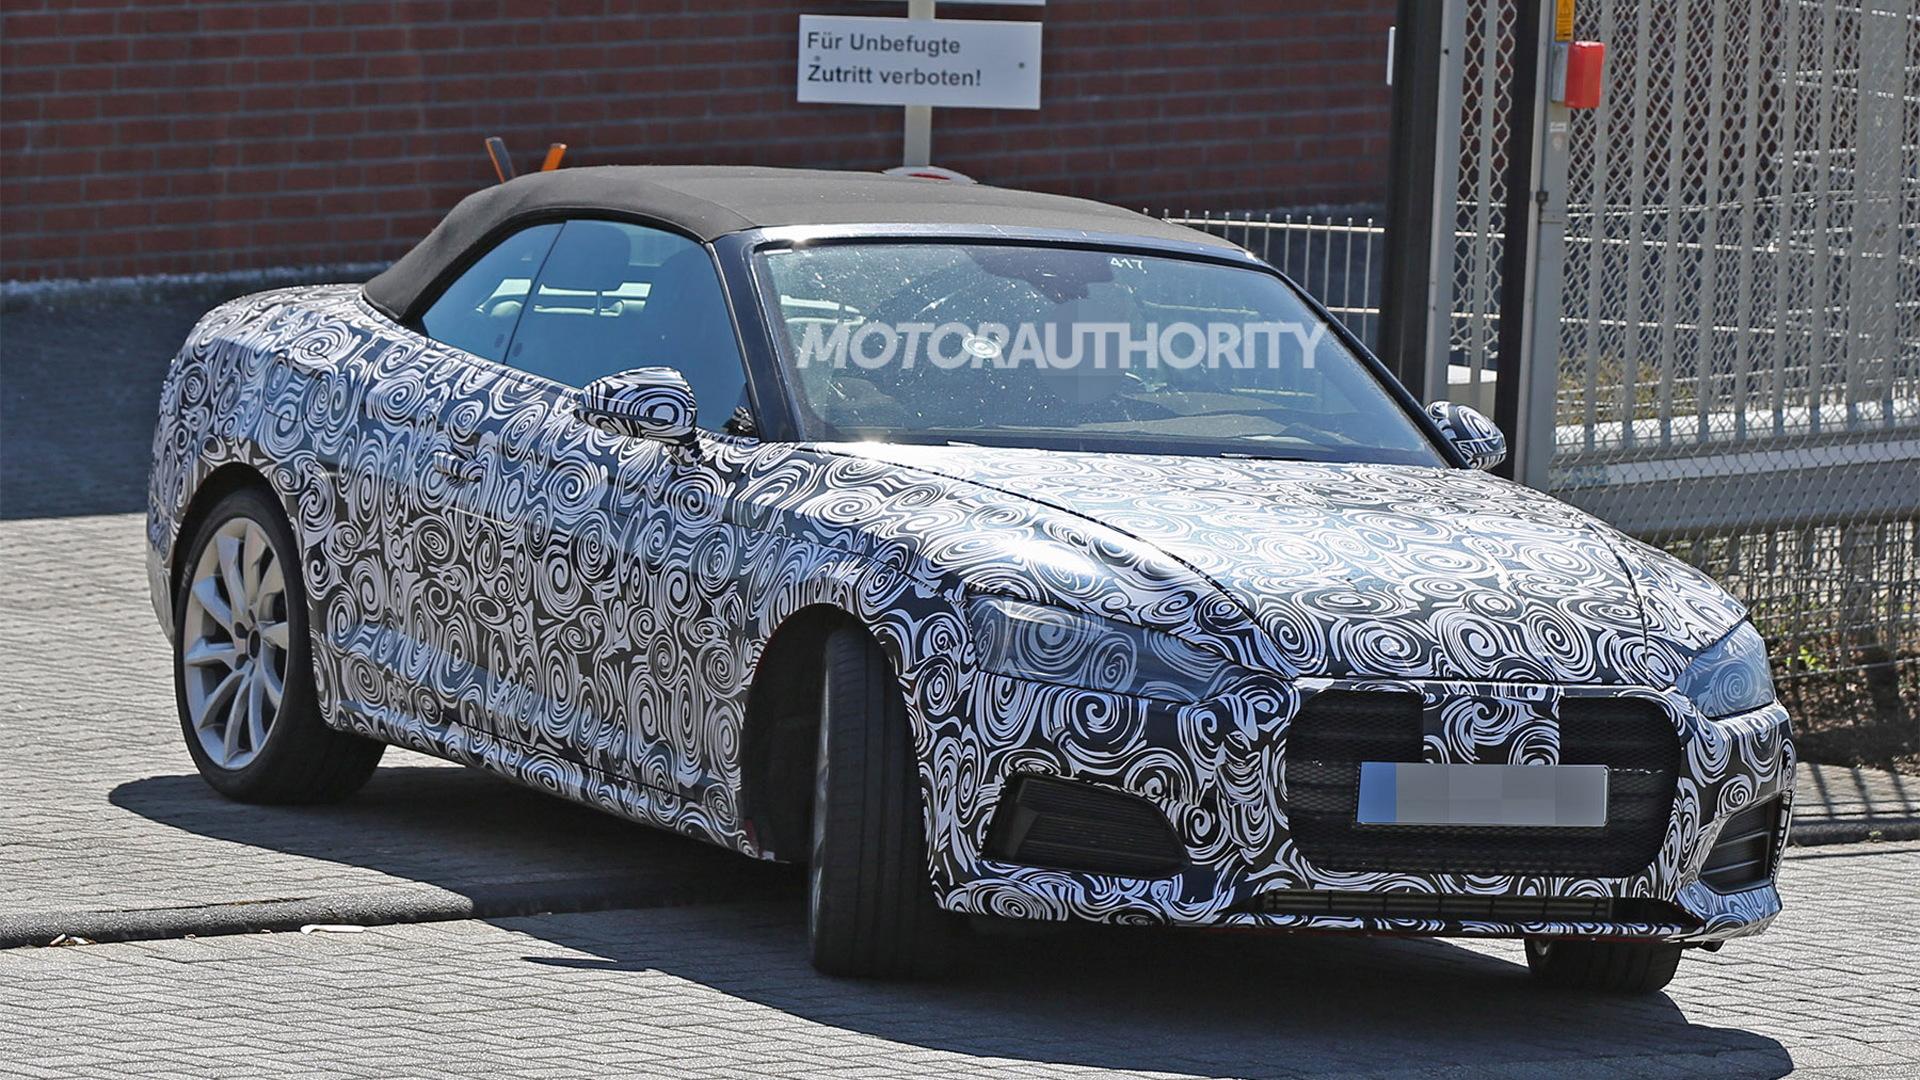 2018 Audi S5 Cabriolet spy shots - Image via S. Baldauf/SB-Medien